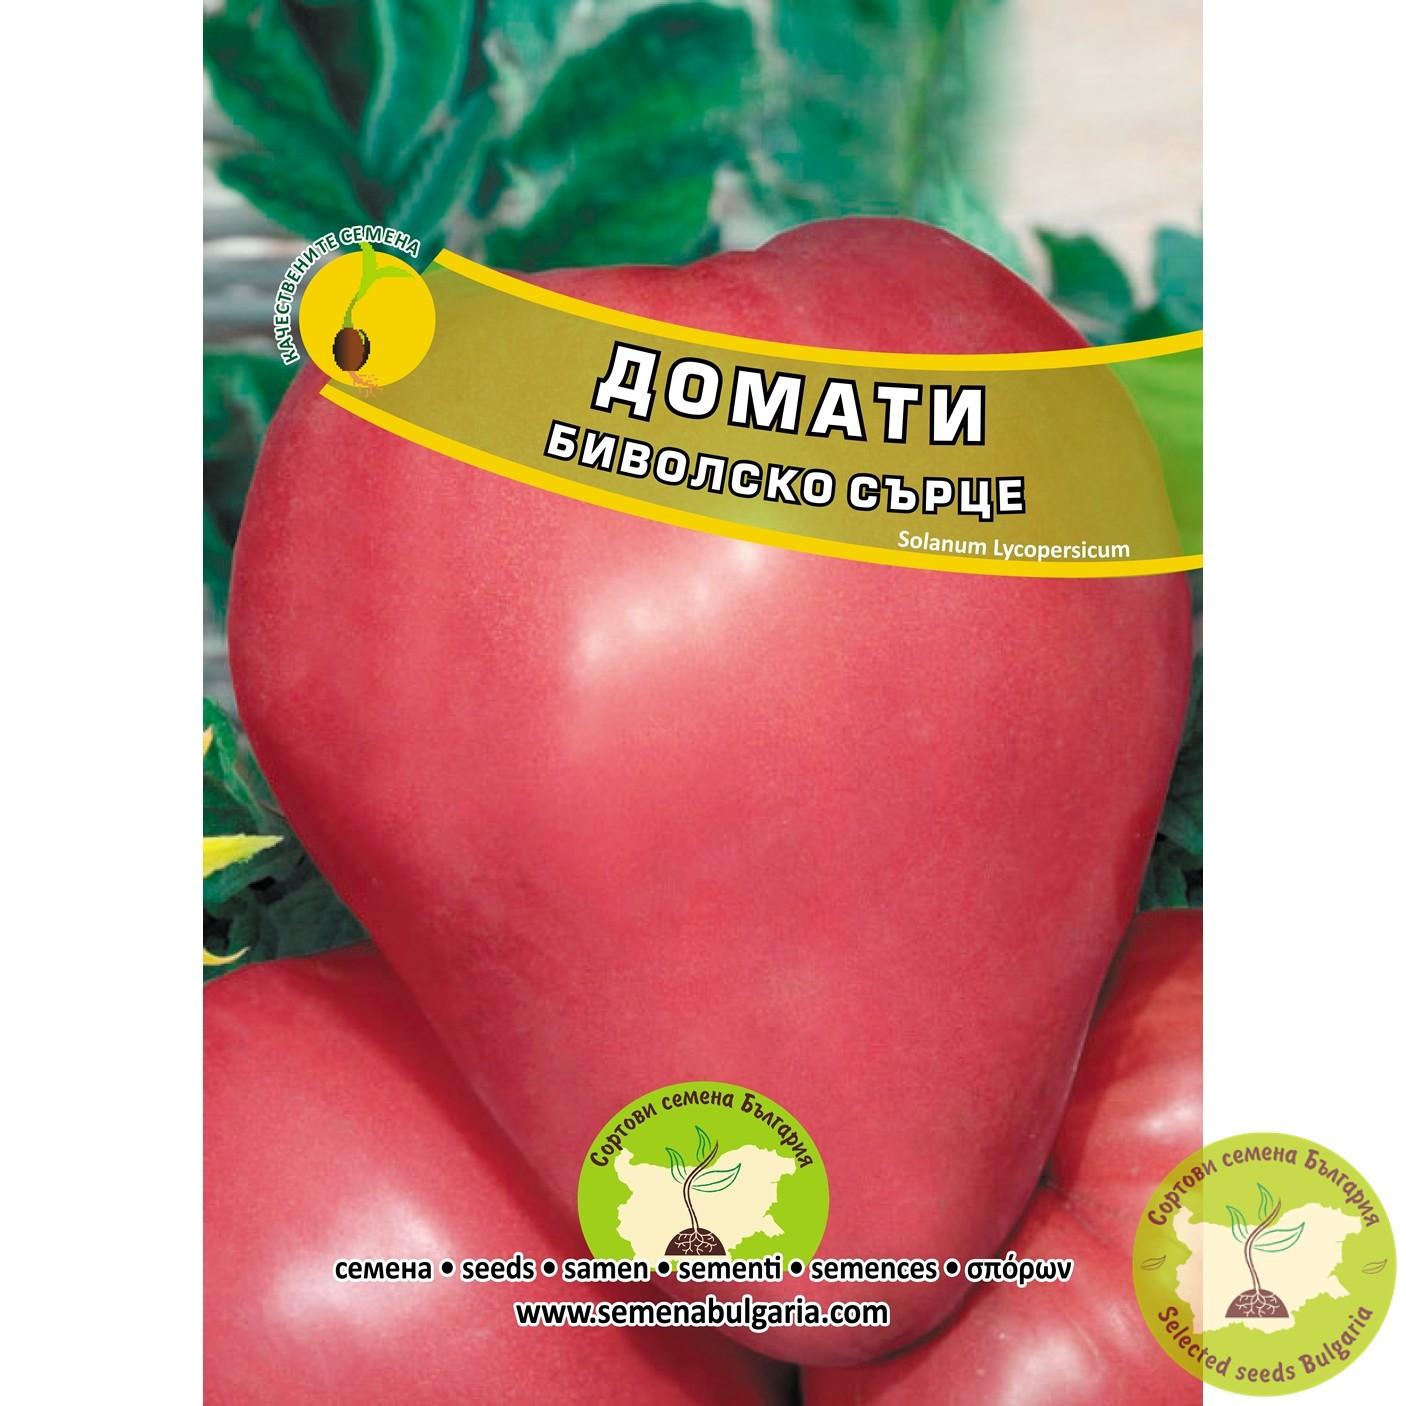 Семена домати Биволско сърце розов